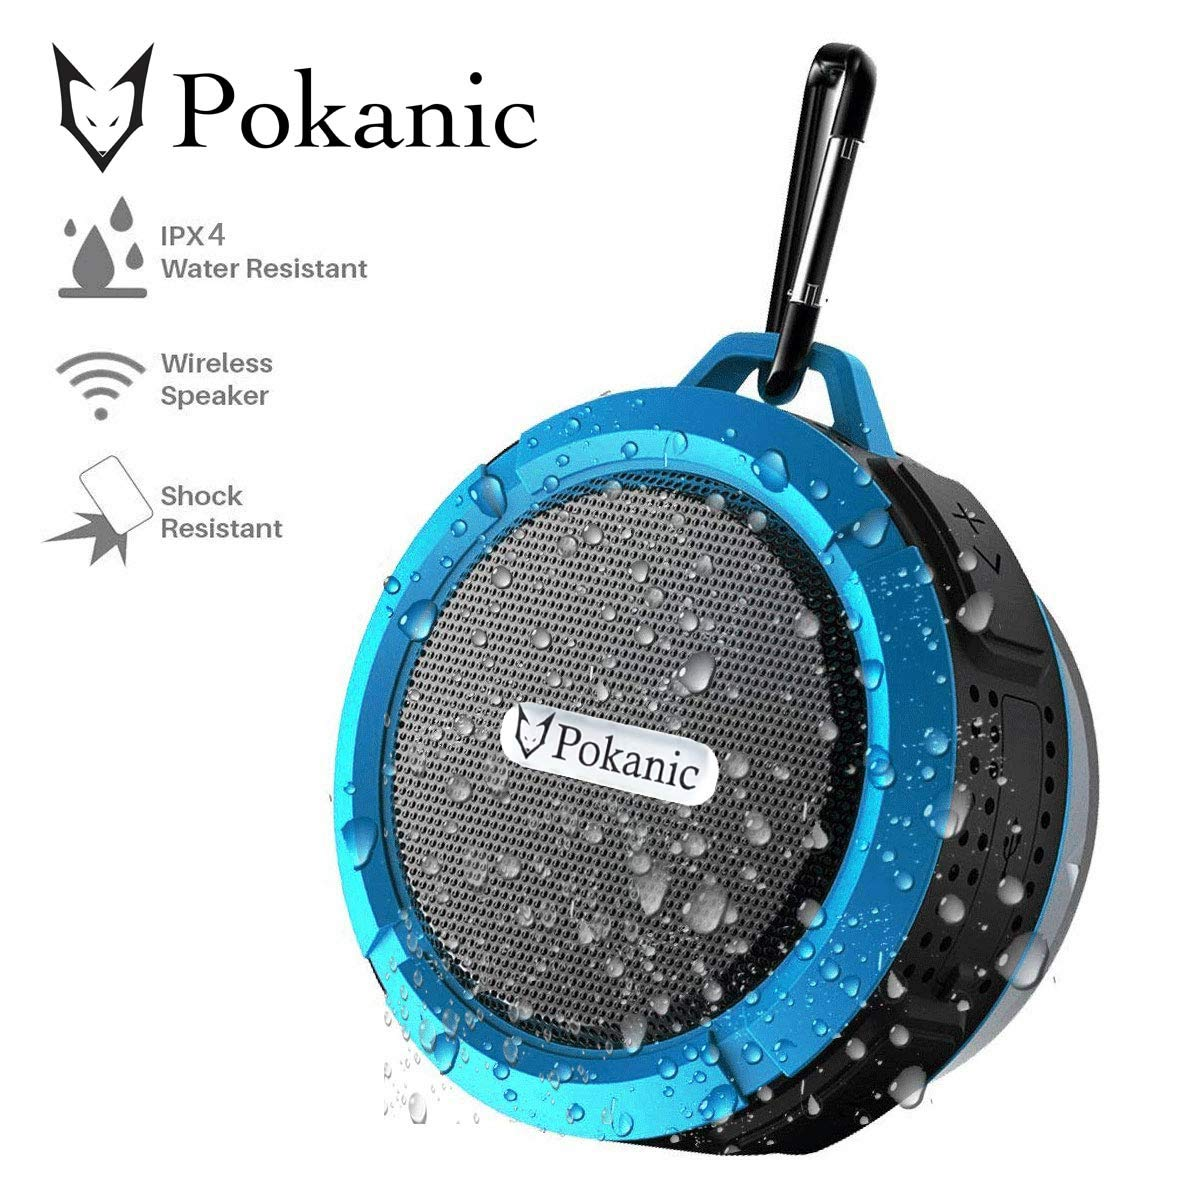 HD防水Bluetooth3.0シャワースピーカー Pokanic防水ハンズフリーポータブルスピーカーフォン 内蔵マイク 6時間再生 コントロールボタン 専用吸盤 アップグレードバージョン ブルー   B07LCBG6RB